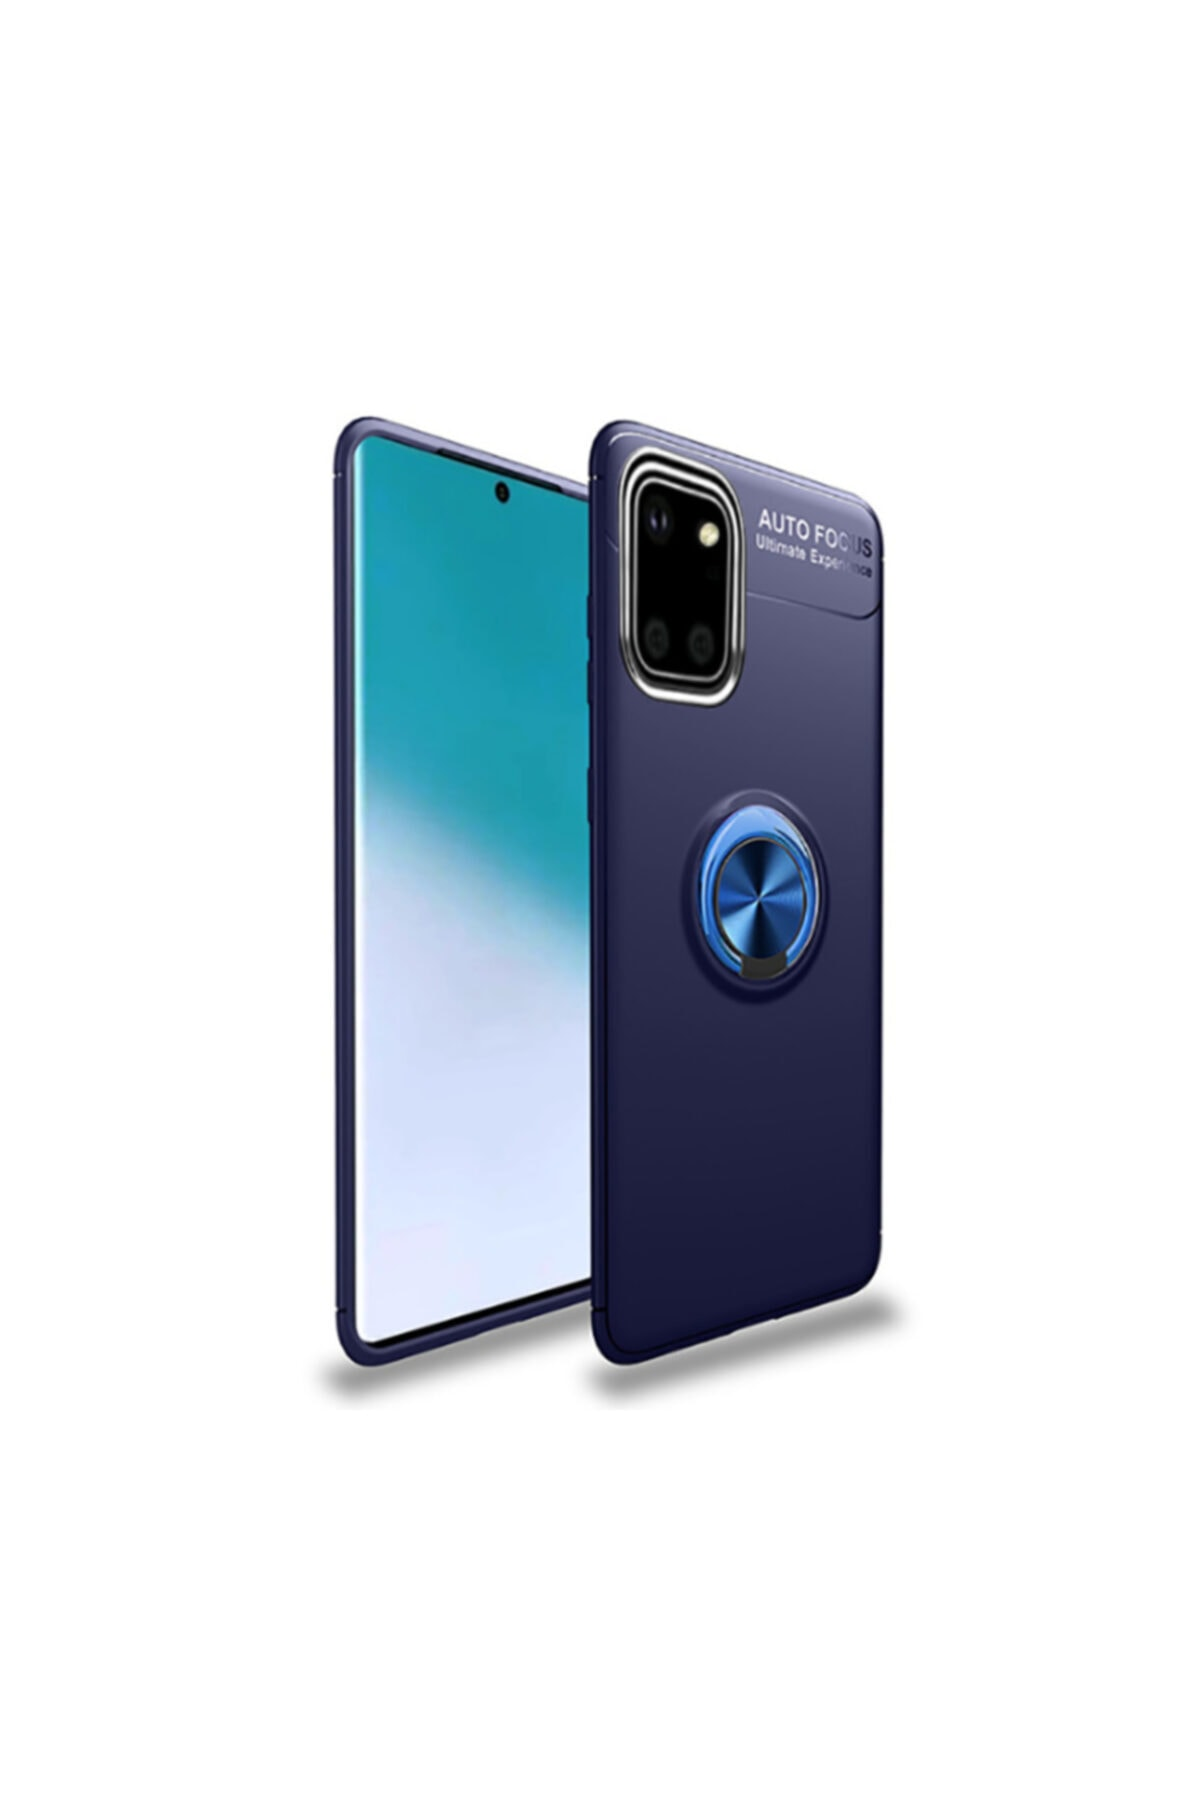 Canpay Galaxy Note 10 Lite Kılıf Yüzüklü Standlı Ve Mıknatıs Özellikli Lüx Silikon 1